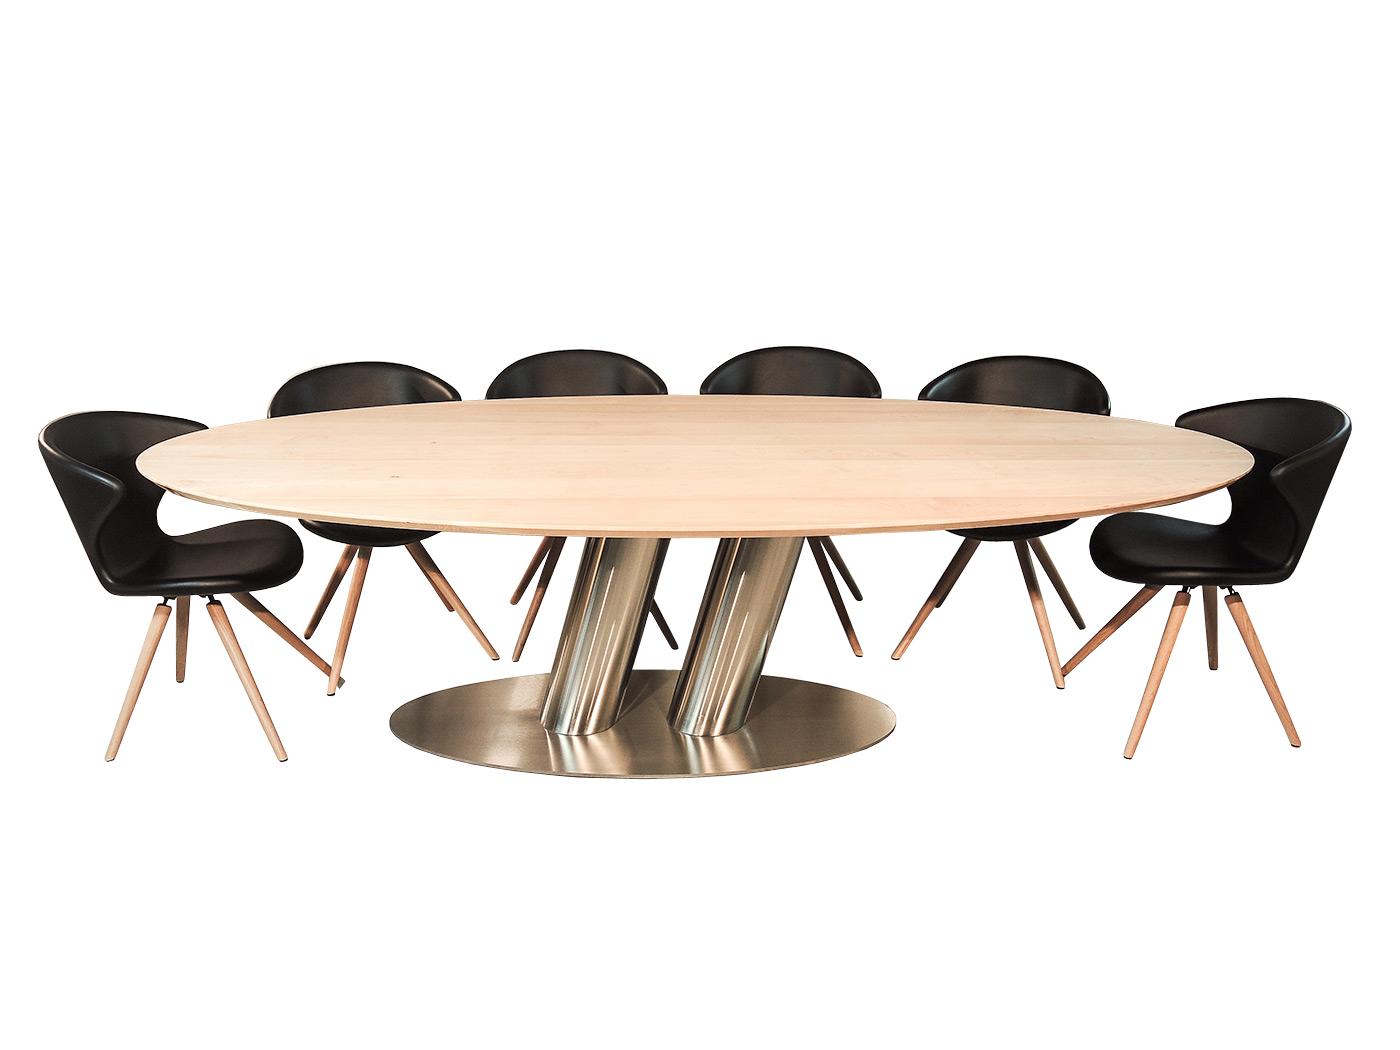 Grote Strakke Eettafel.Puglia Grote Ovale Design Tafel